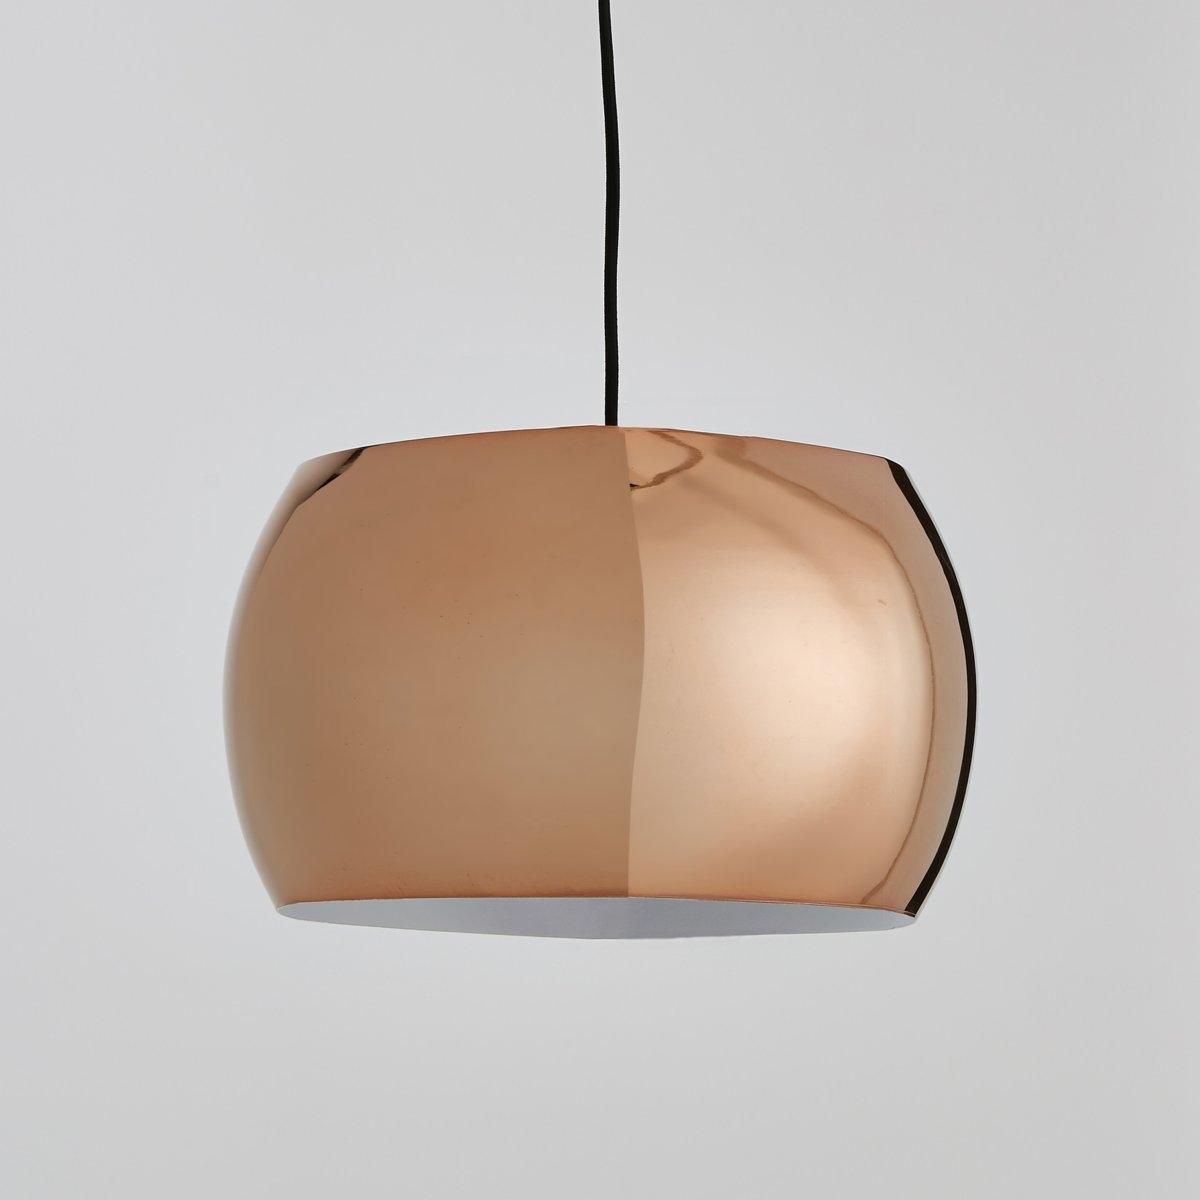 Светильник в виде шара медного цвета, Elori от La Redoute